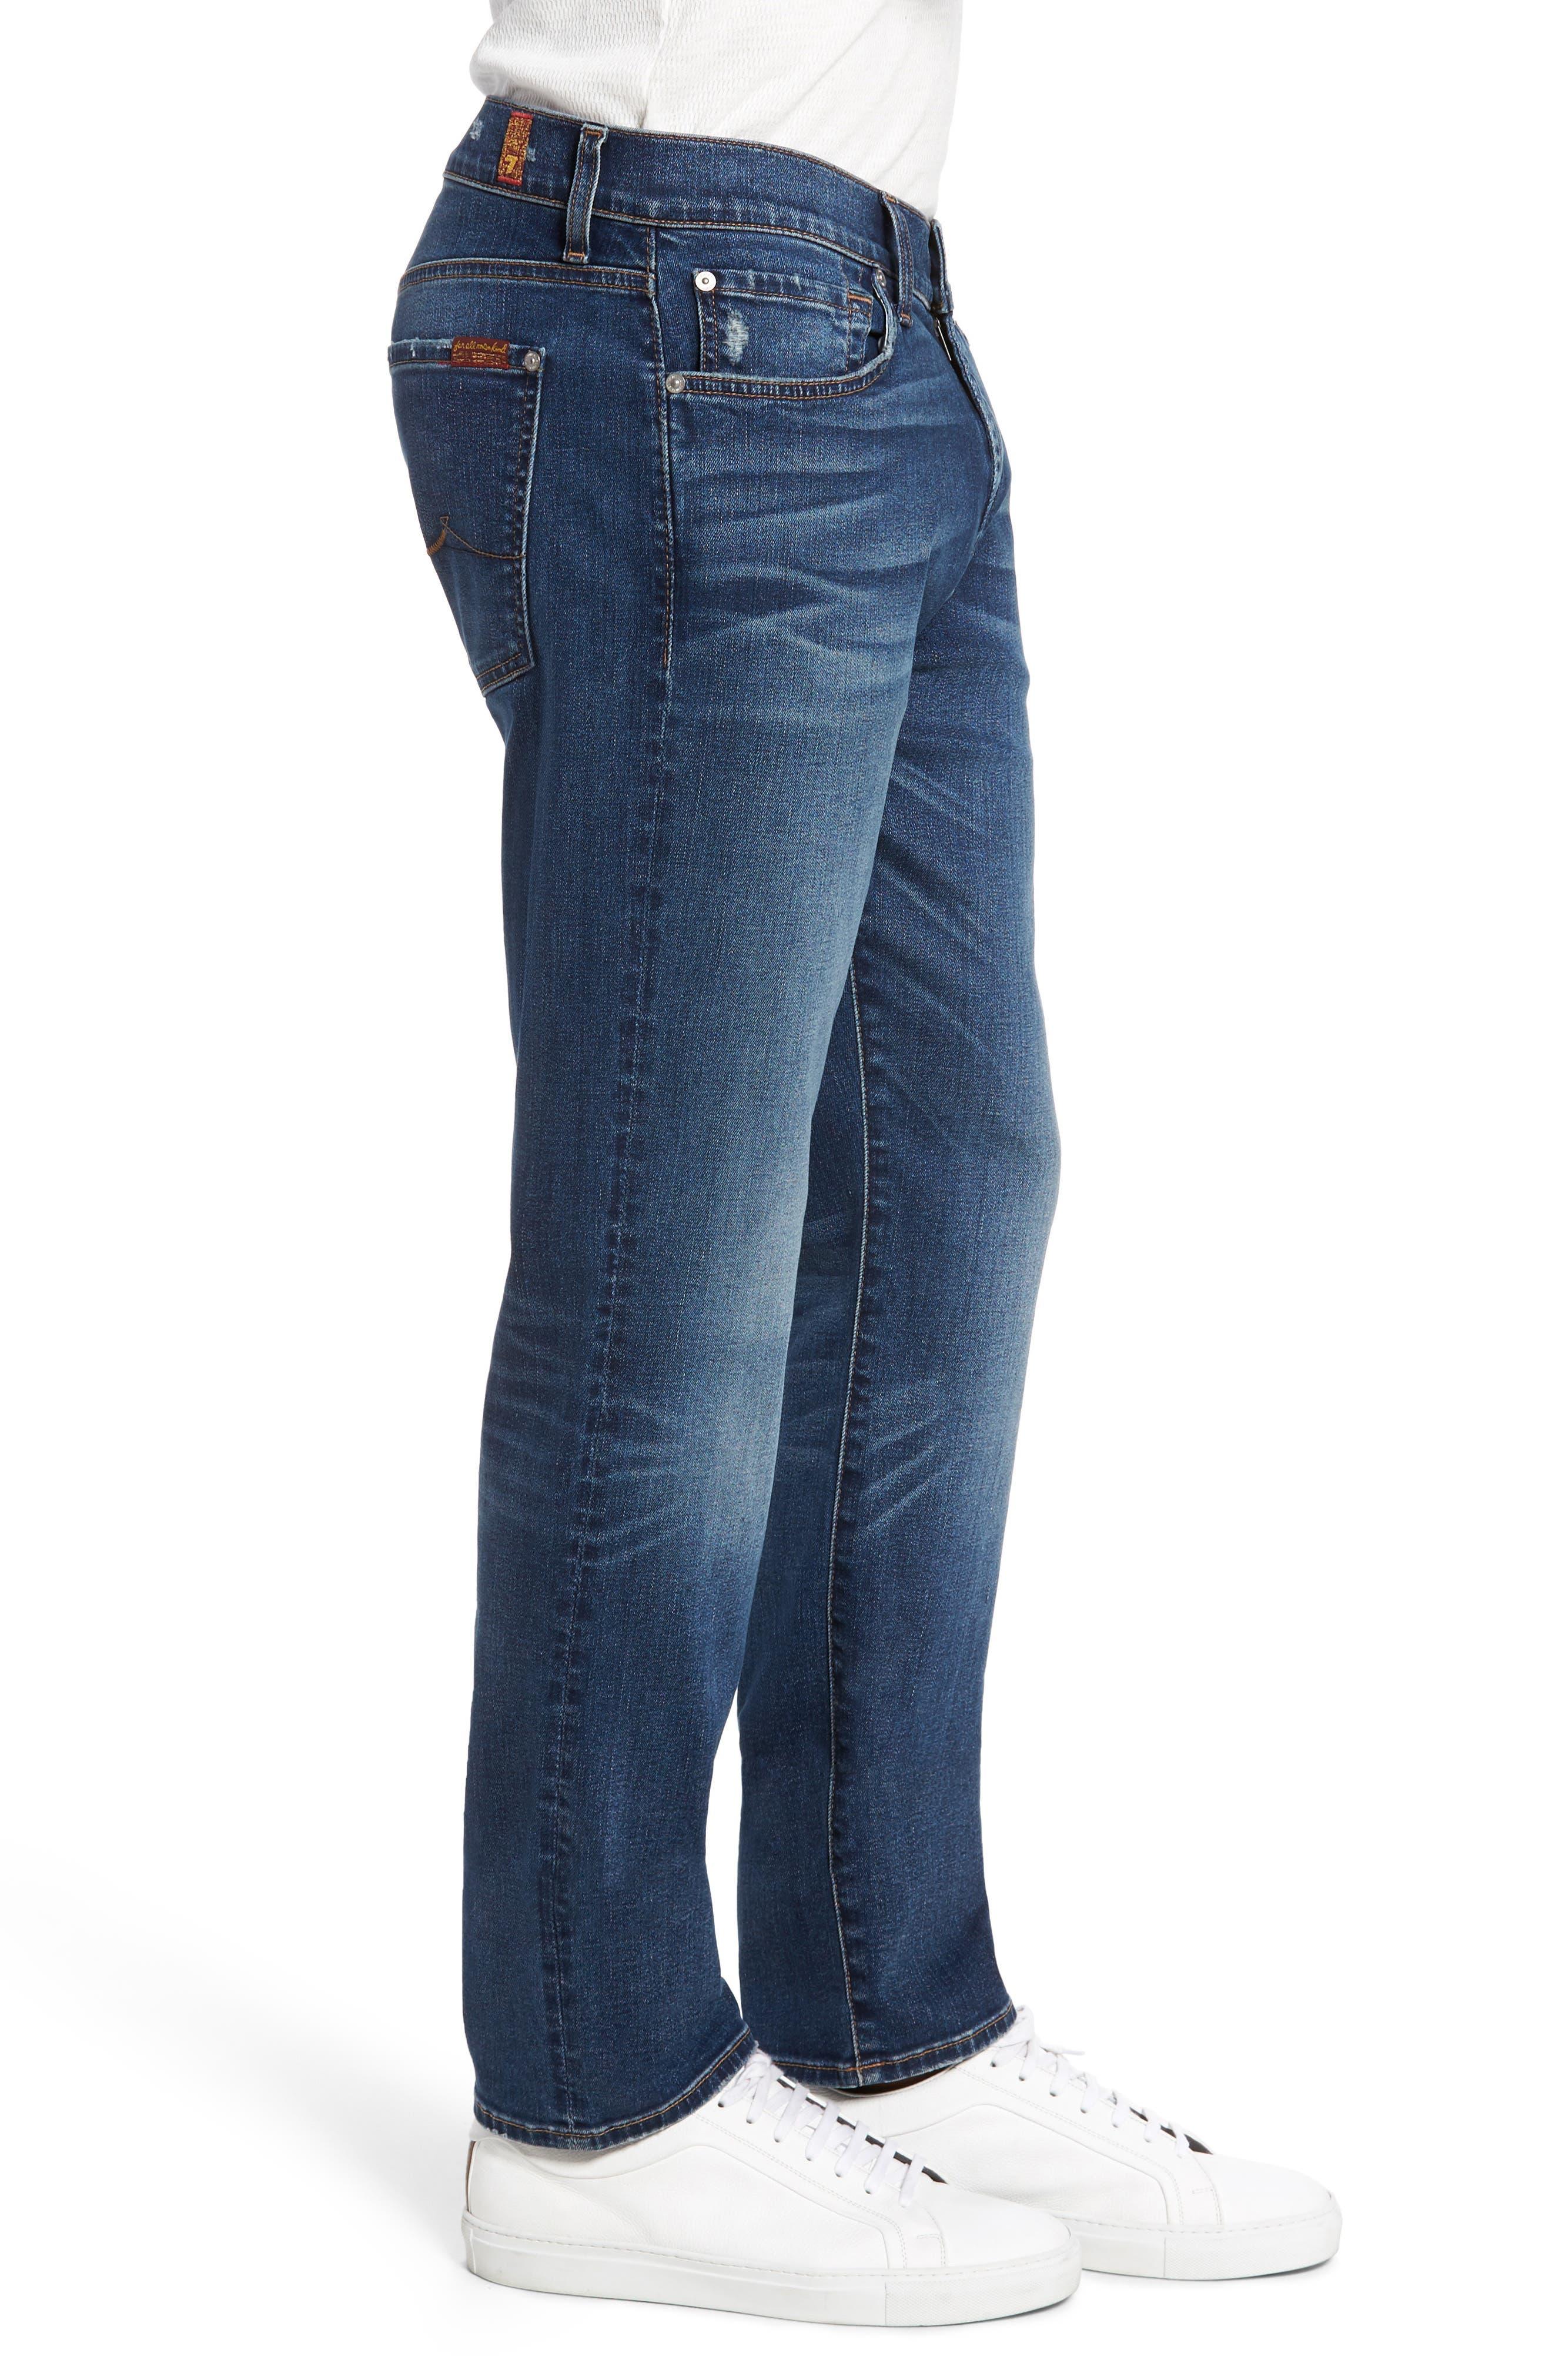 Slimmy Slim Fit Jeans,                             Alternate thumbnail 3, color,                             407